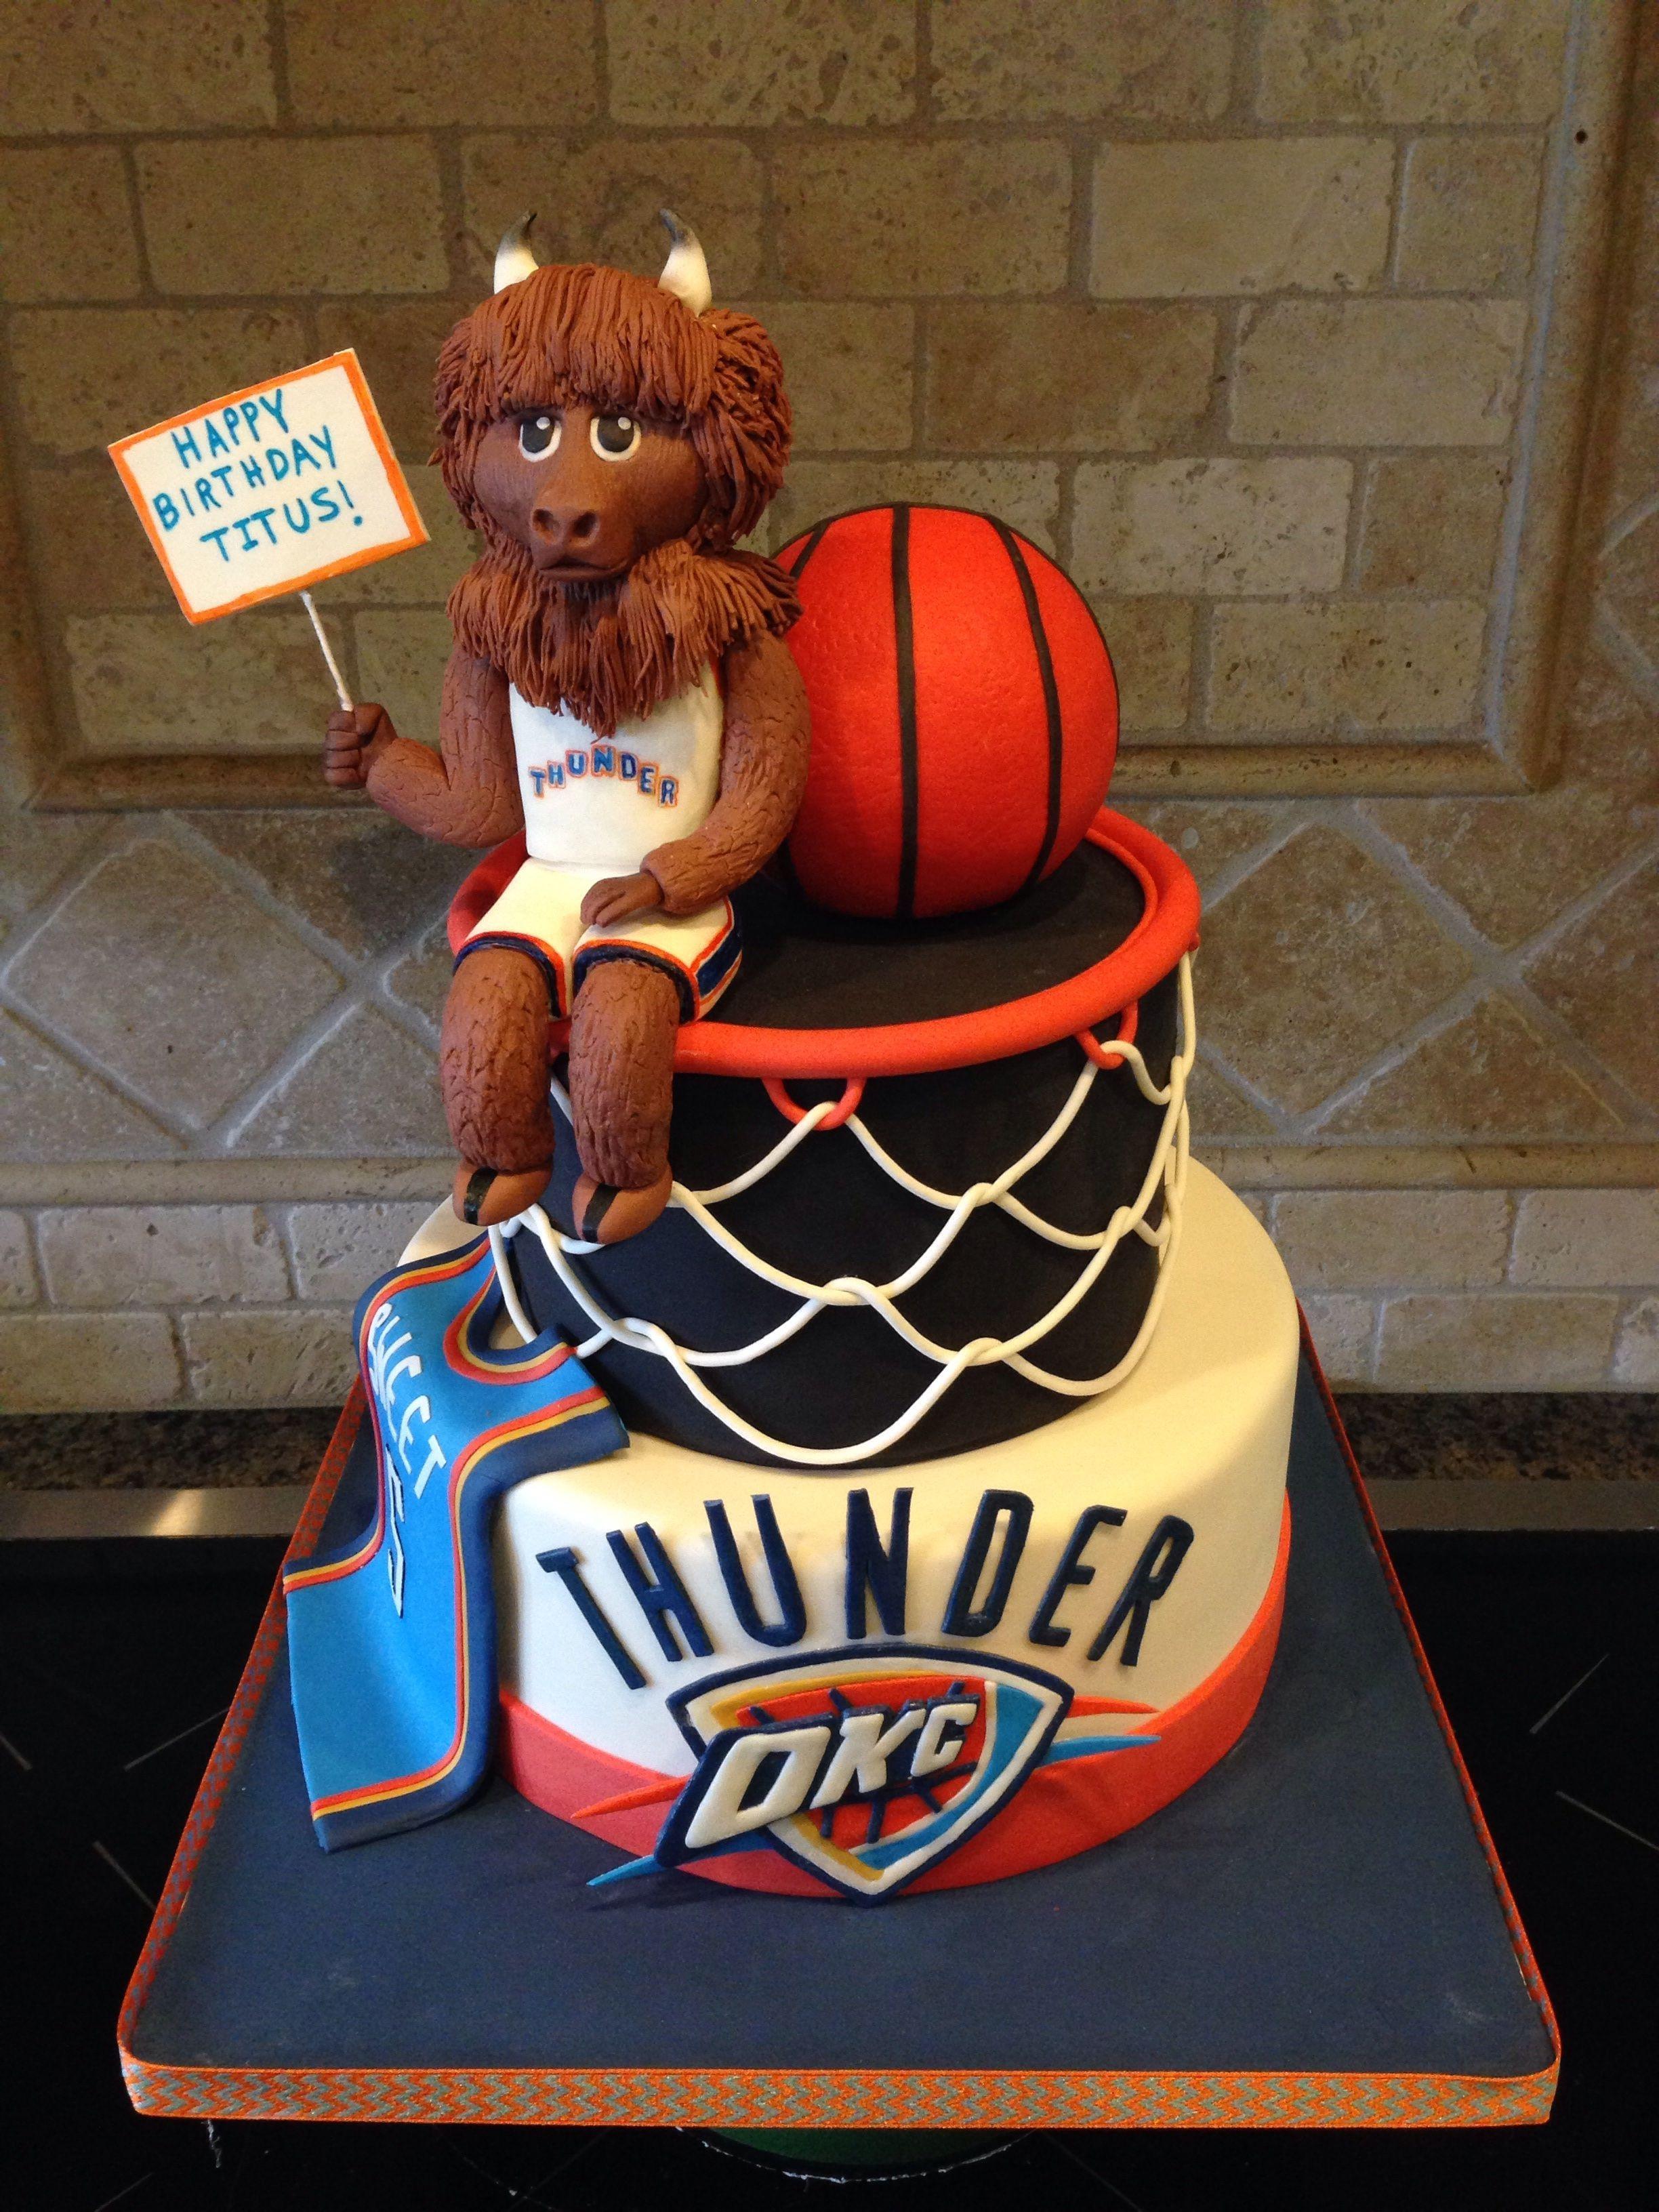 Sensational Thunder Up Okc Thunder Cake For 5 Year Old Boy Ball Is Rkt Covered Birthday Cards Printable Inklcafe Filternl